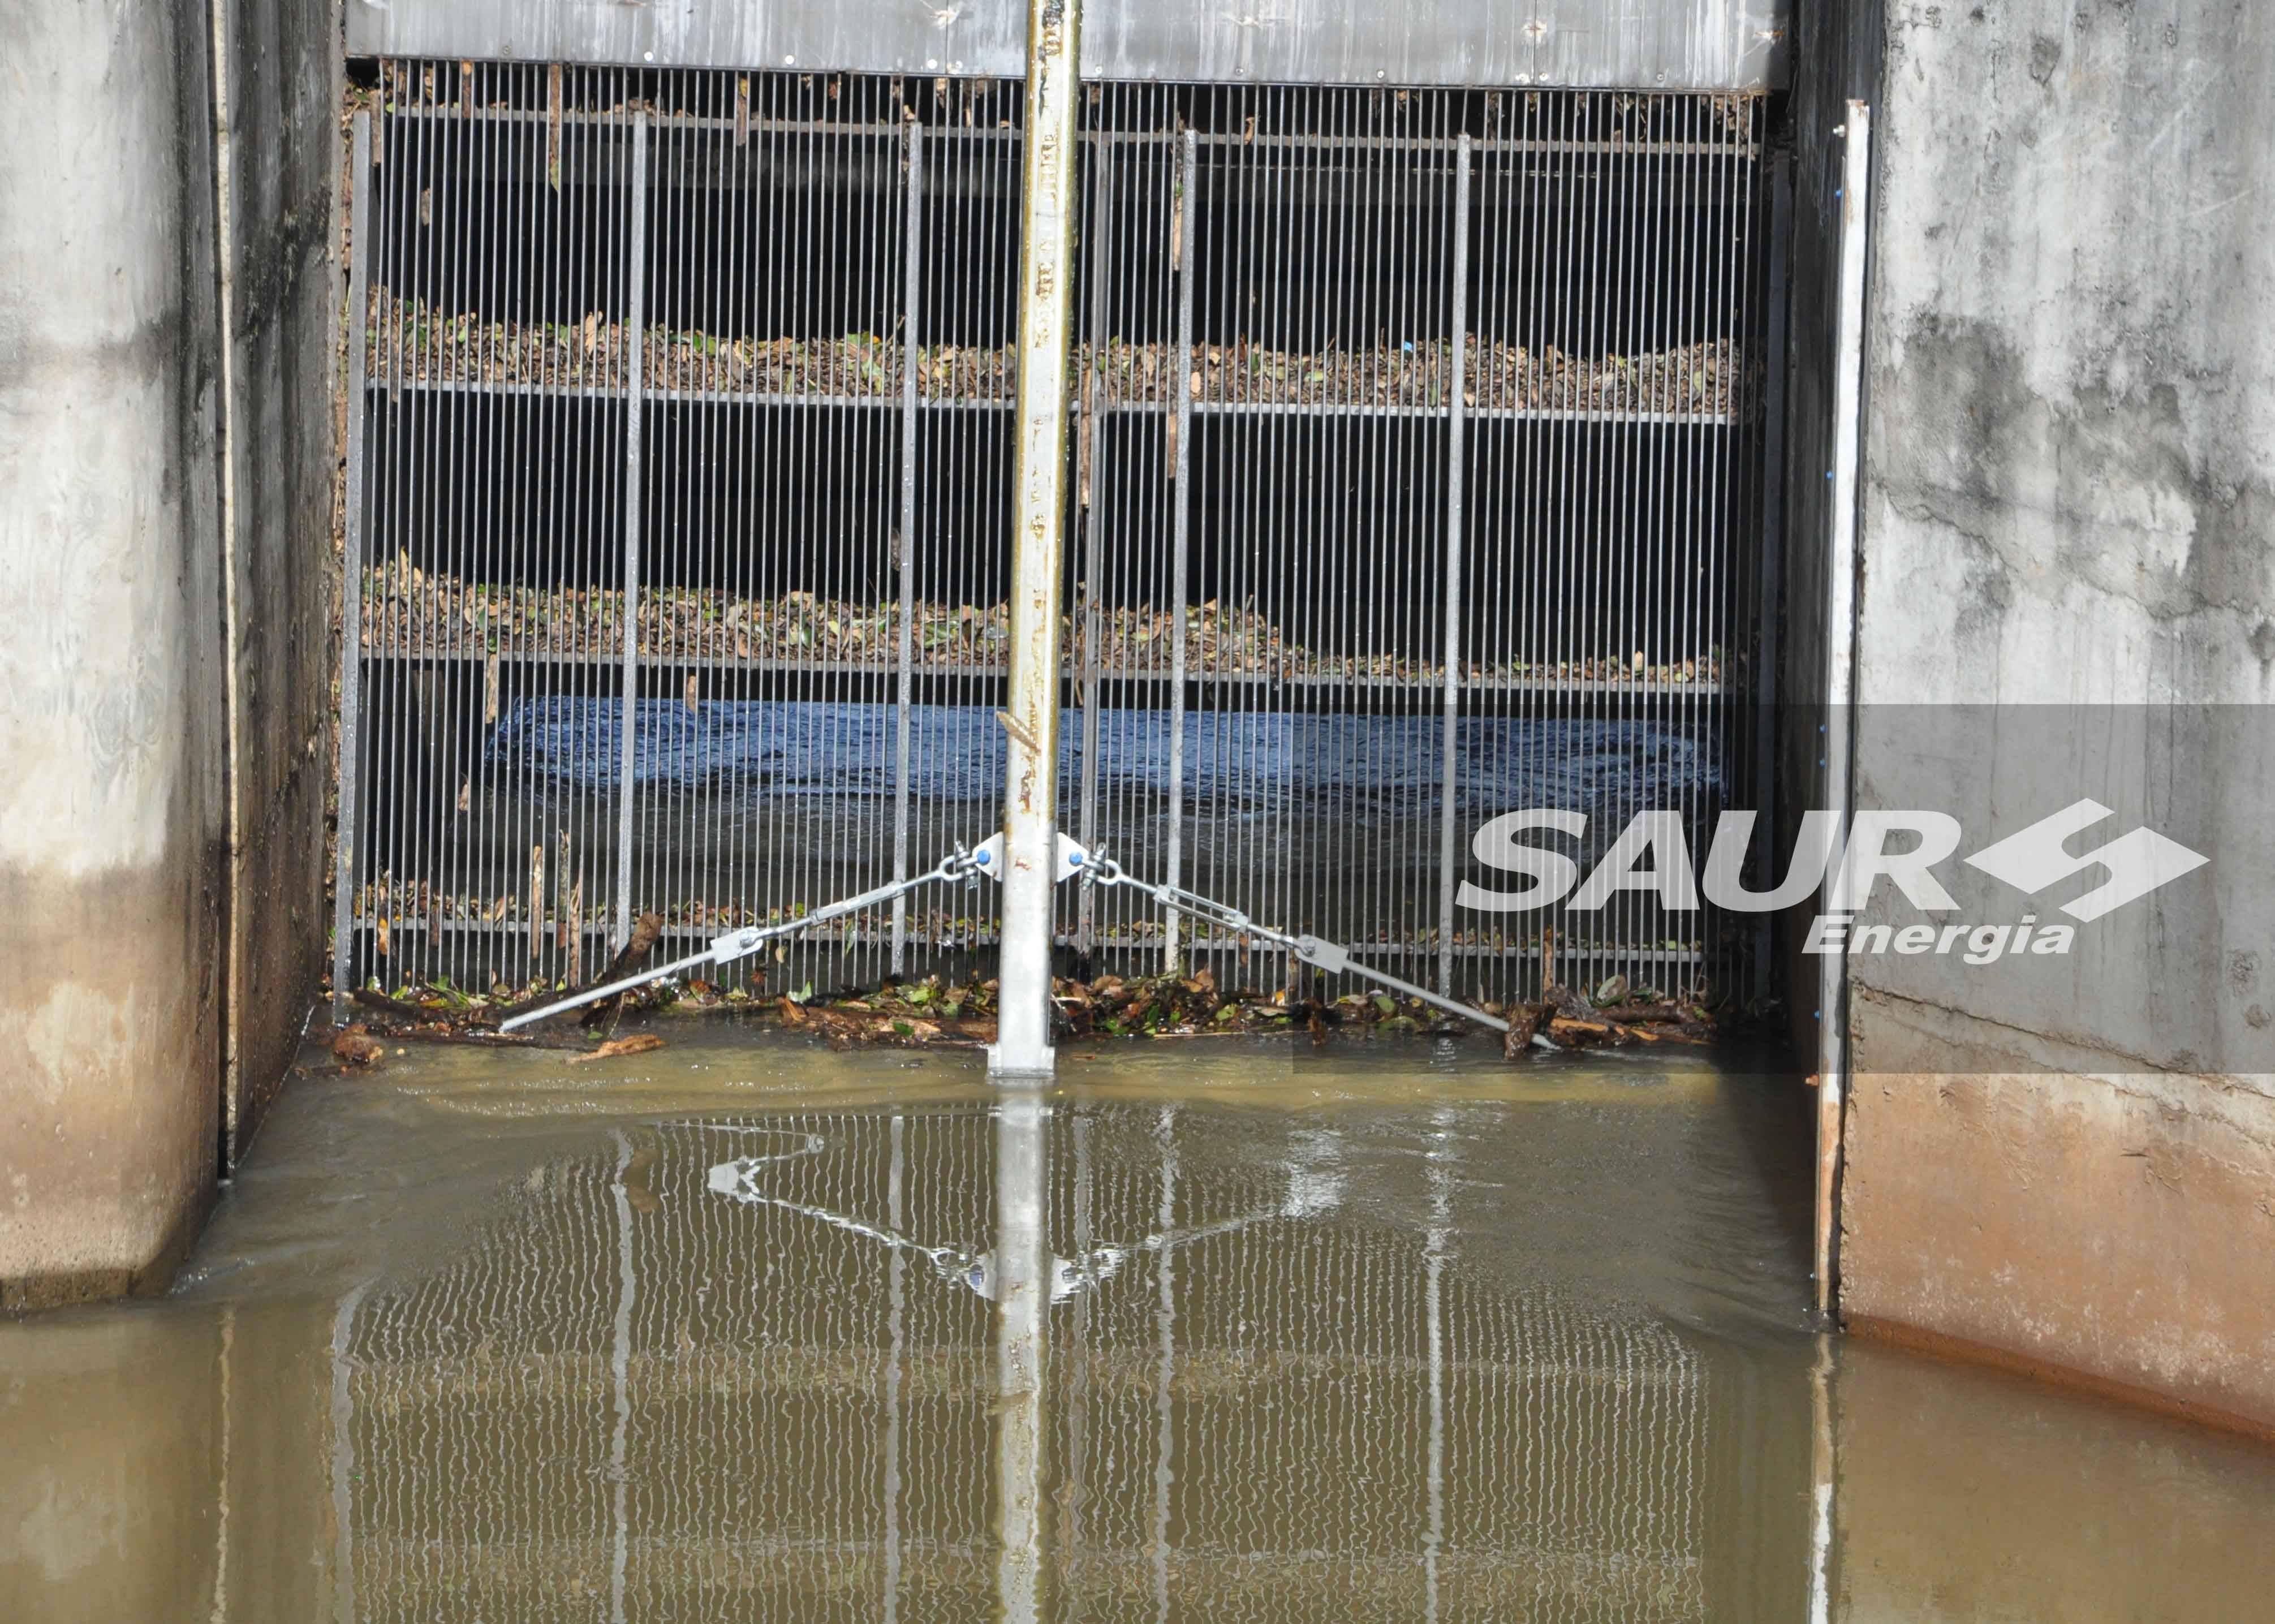 Máquina Limpa Grades Telescópica para Usinas Hidrelétricas